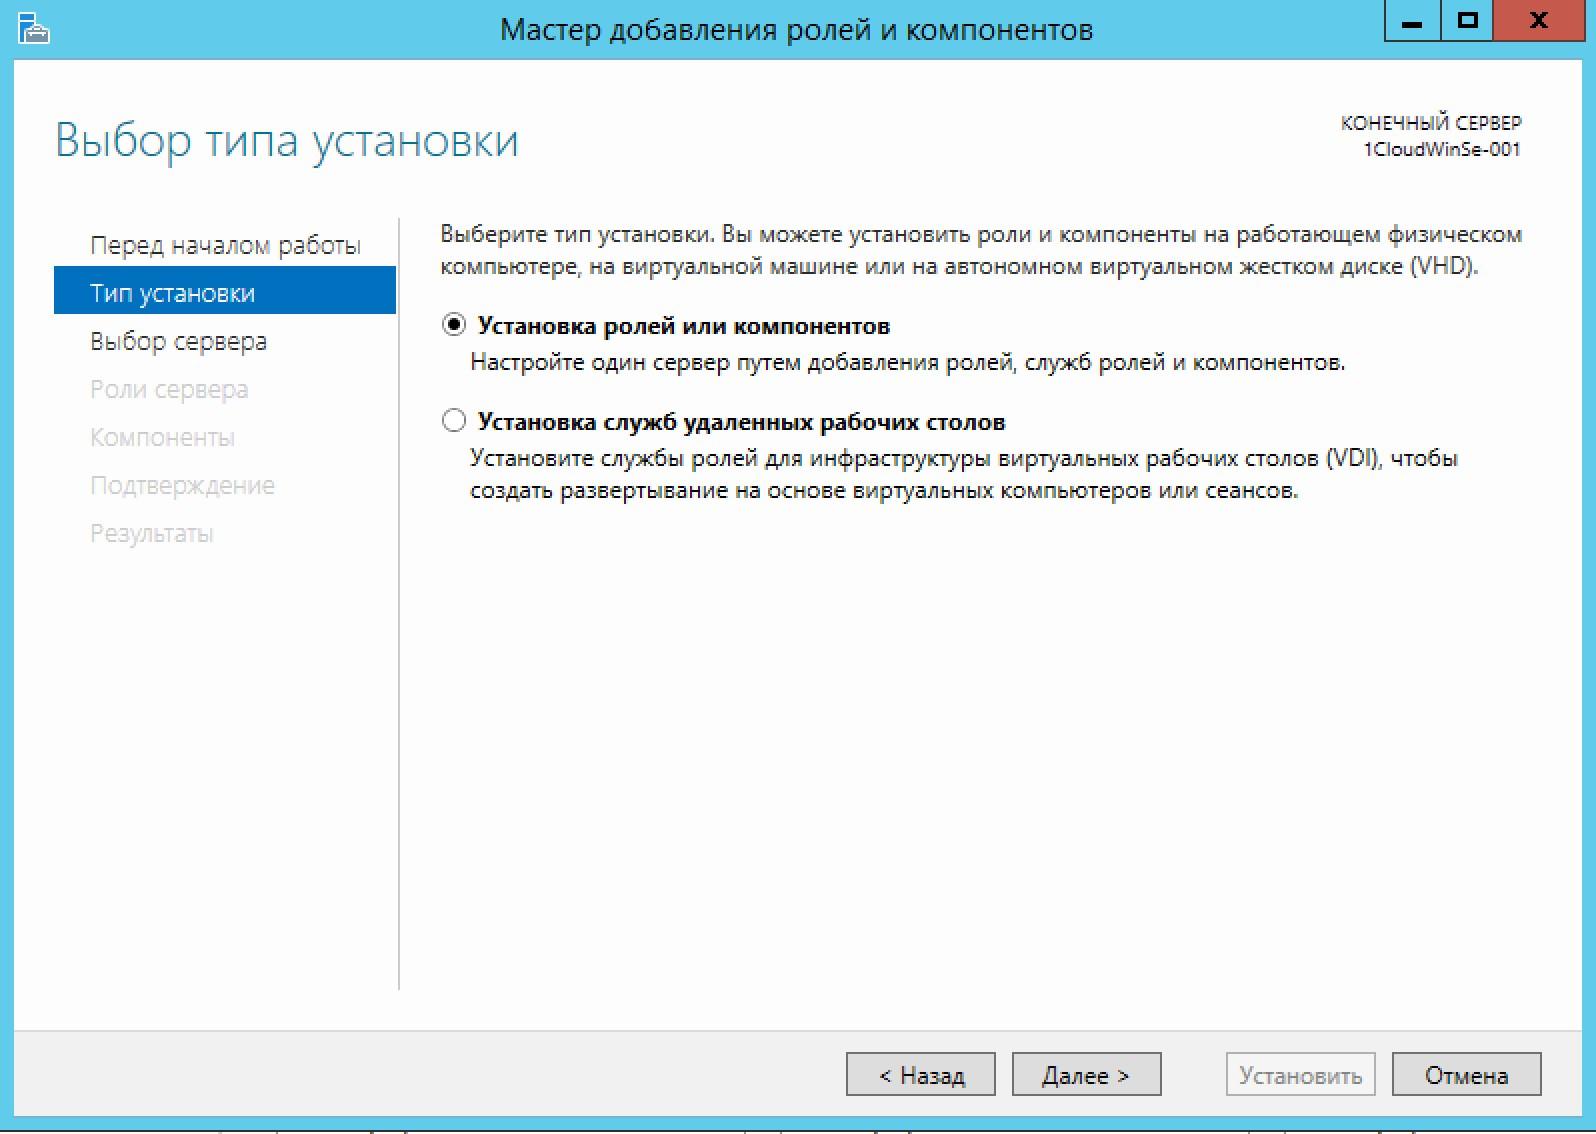 Создание хостинга на windows server 2012 дистрибутив для хостинга